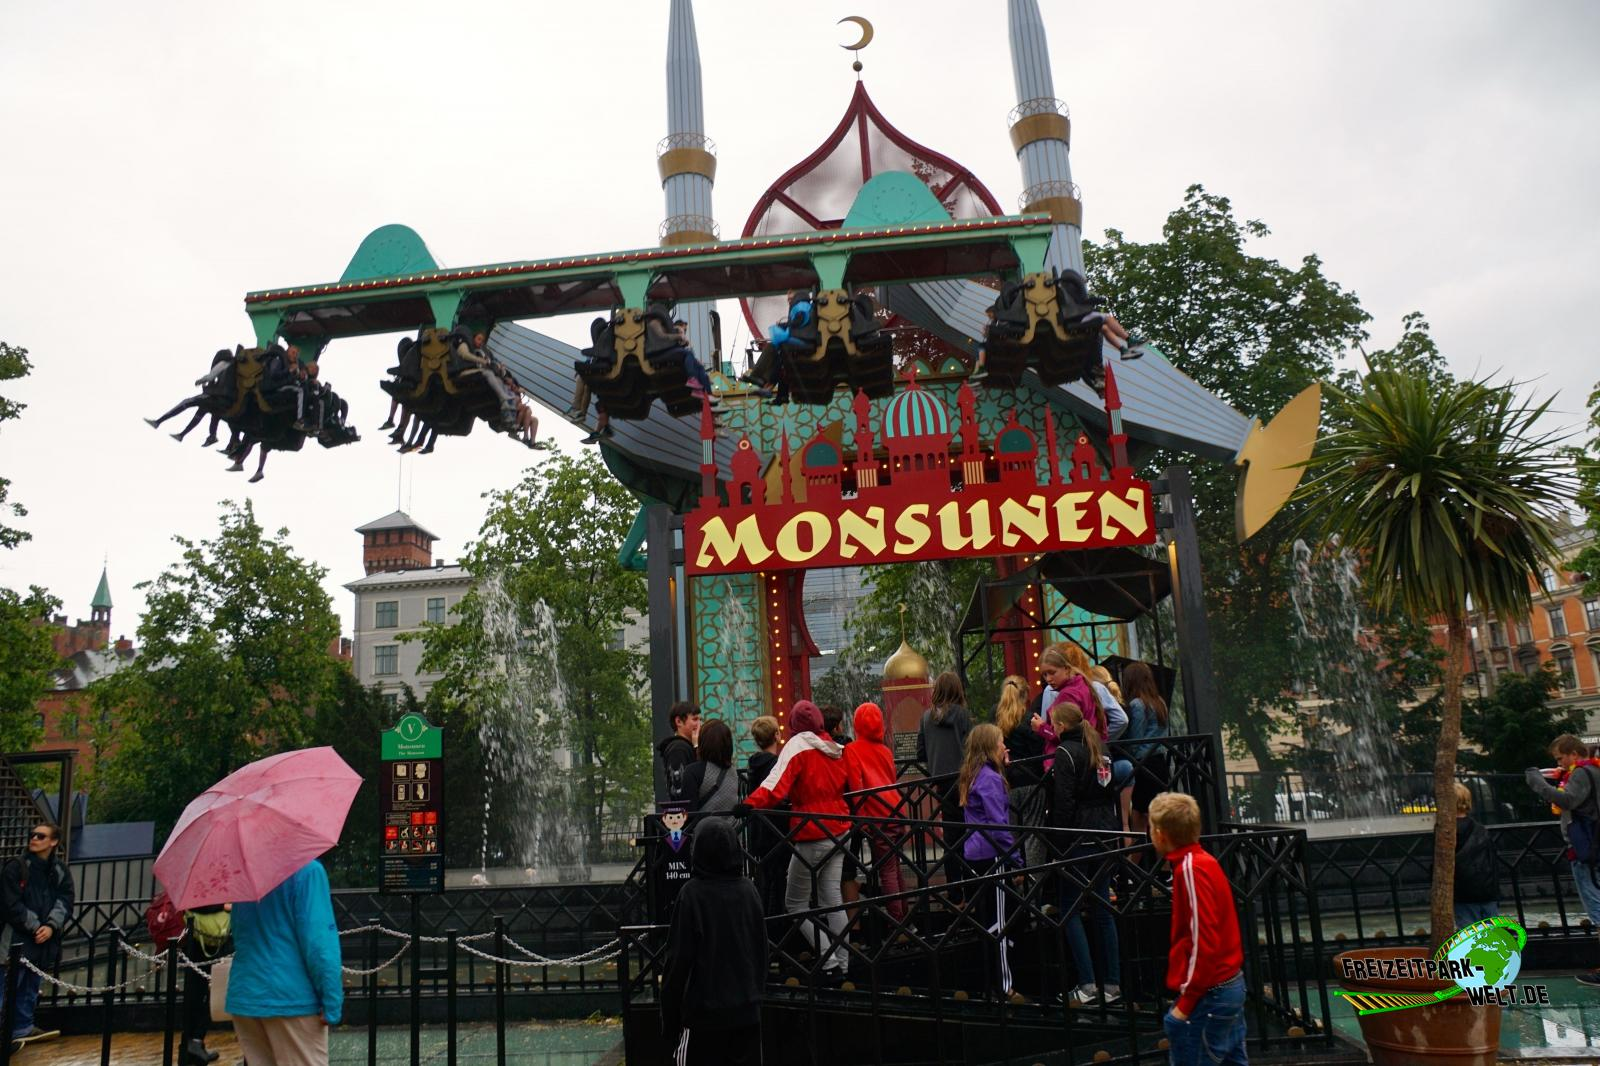 Monsunen Tivoli Gardens Freizeitpark Welt De